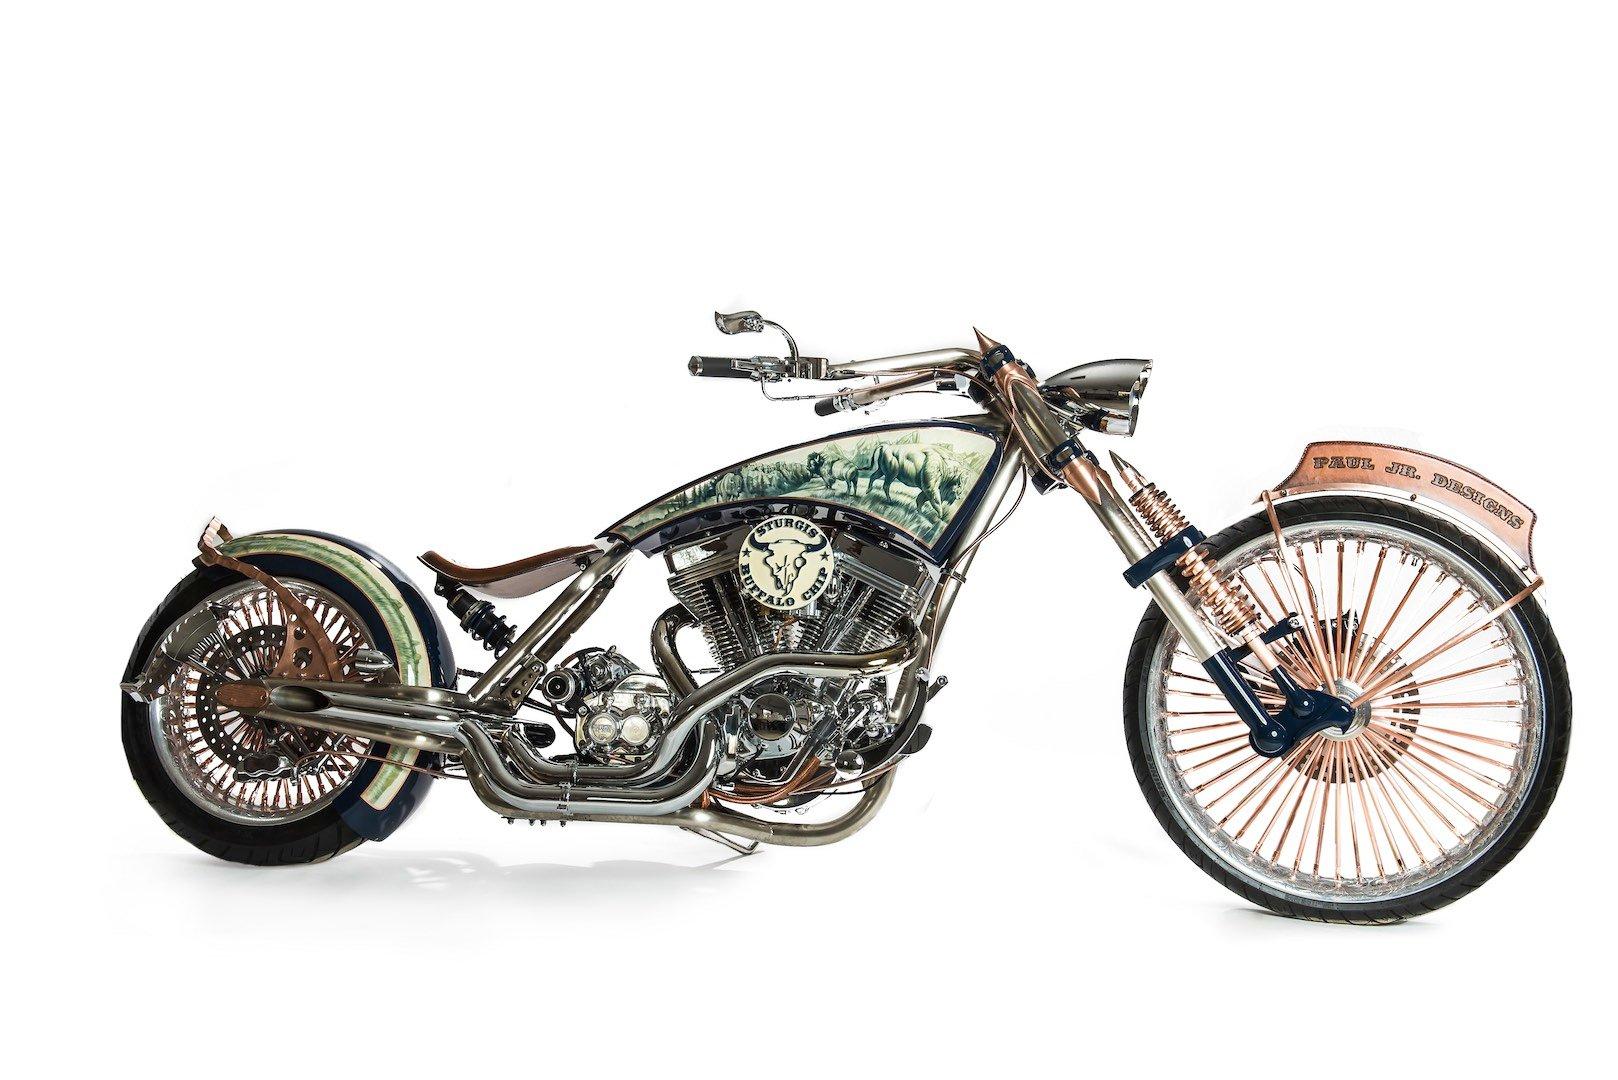 4a8749bf82d Inside Paul Jr. Designs' Buffalo Chip Legends Ride Custom: Exclusive ...